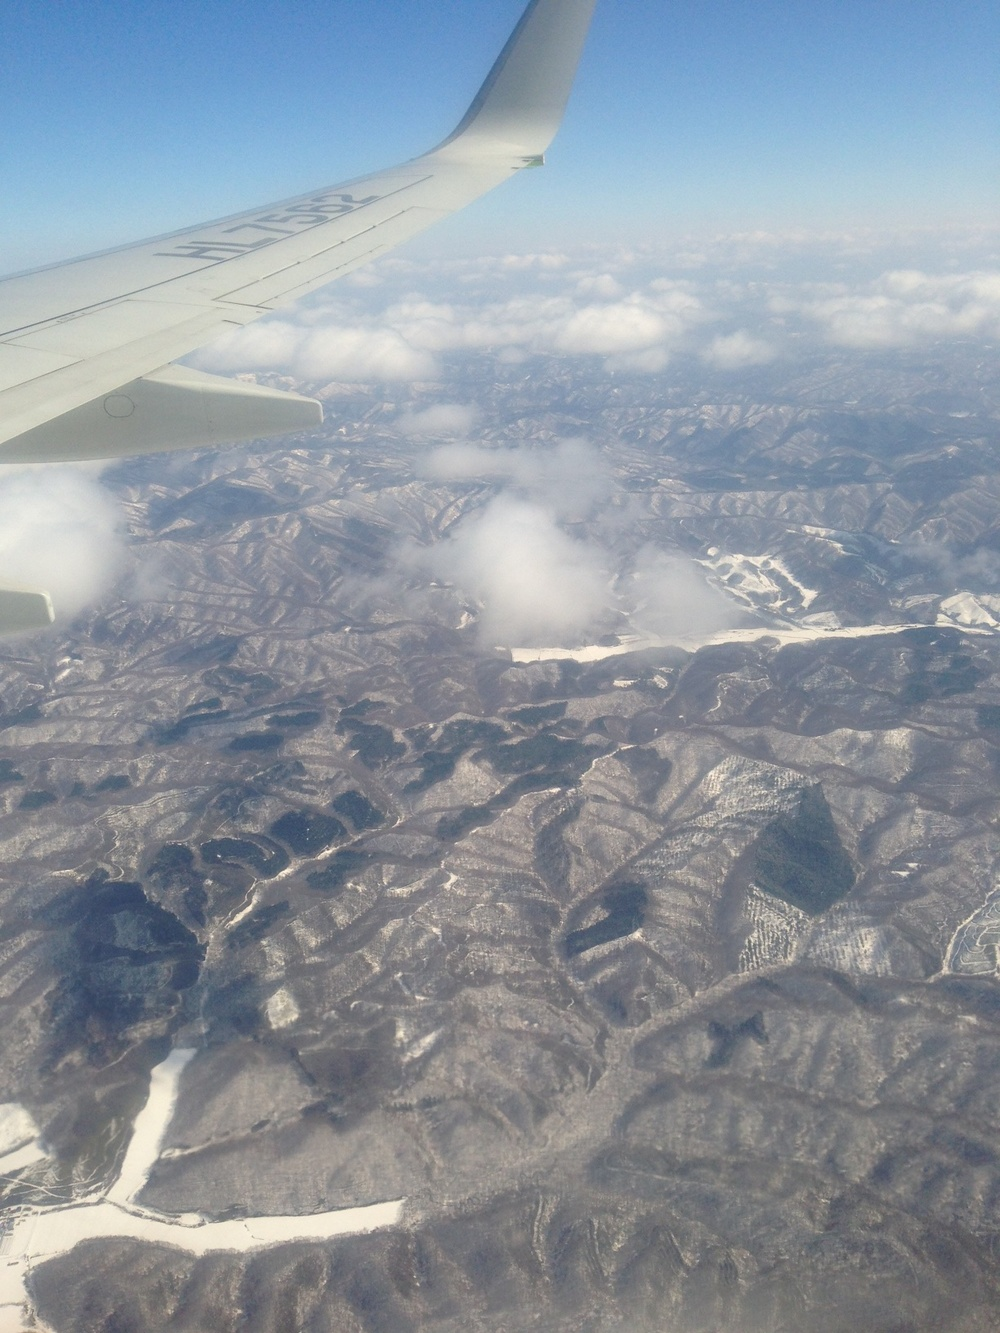 First view of Hokkaido